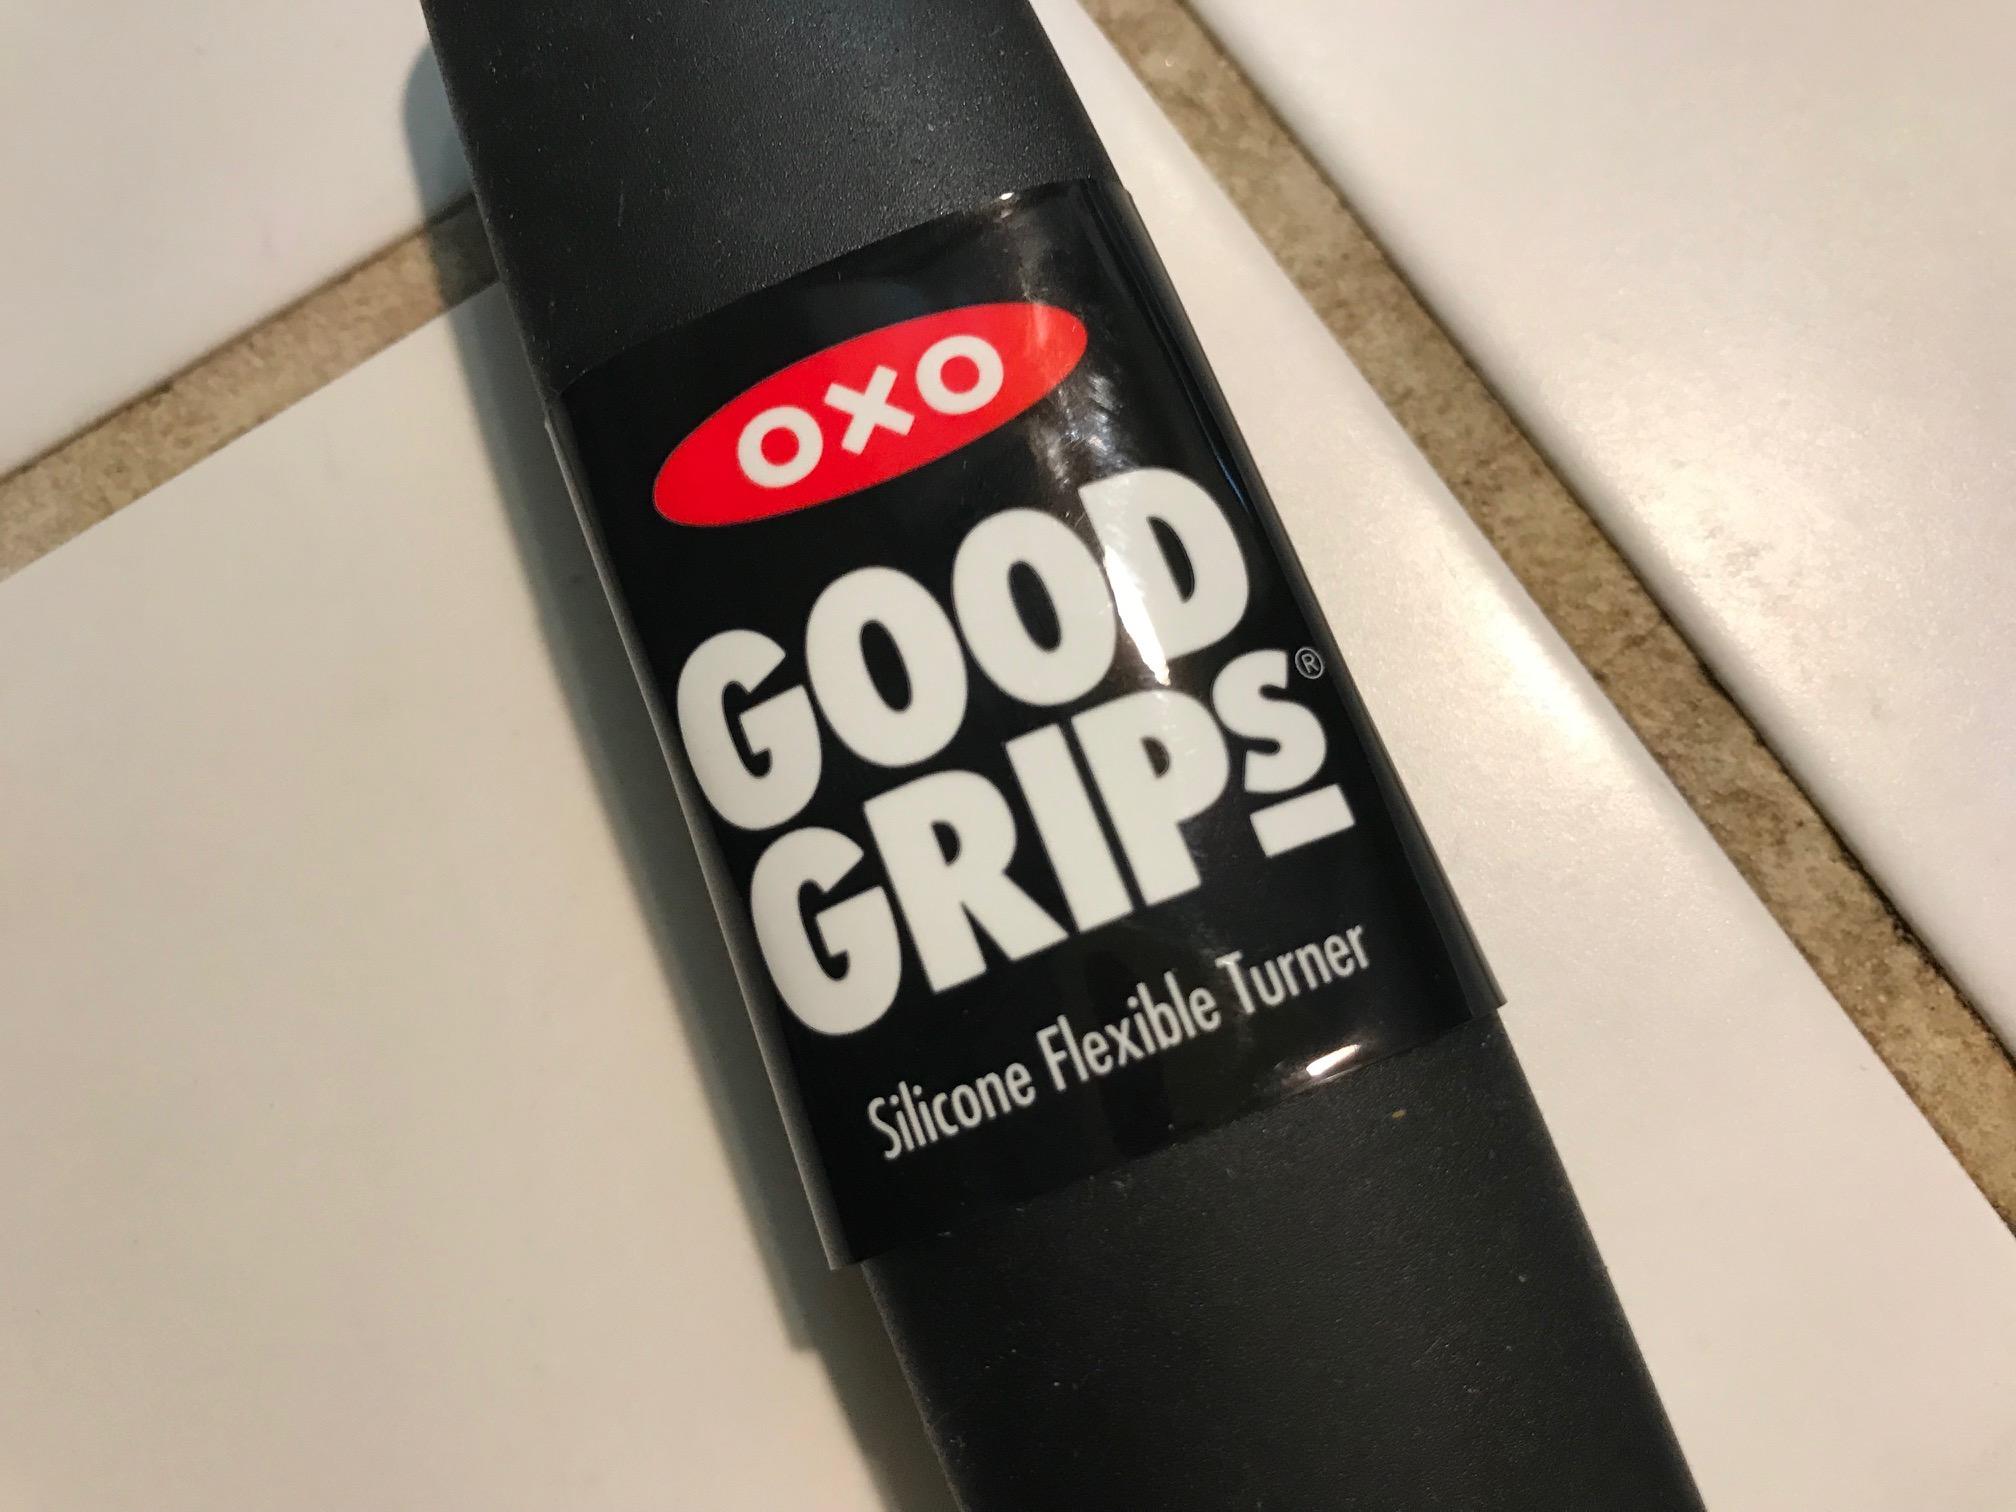 July 2018 New OXO GoodGrips Silicone Flexible Turner Spatula